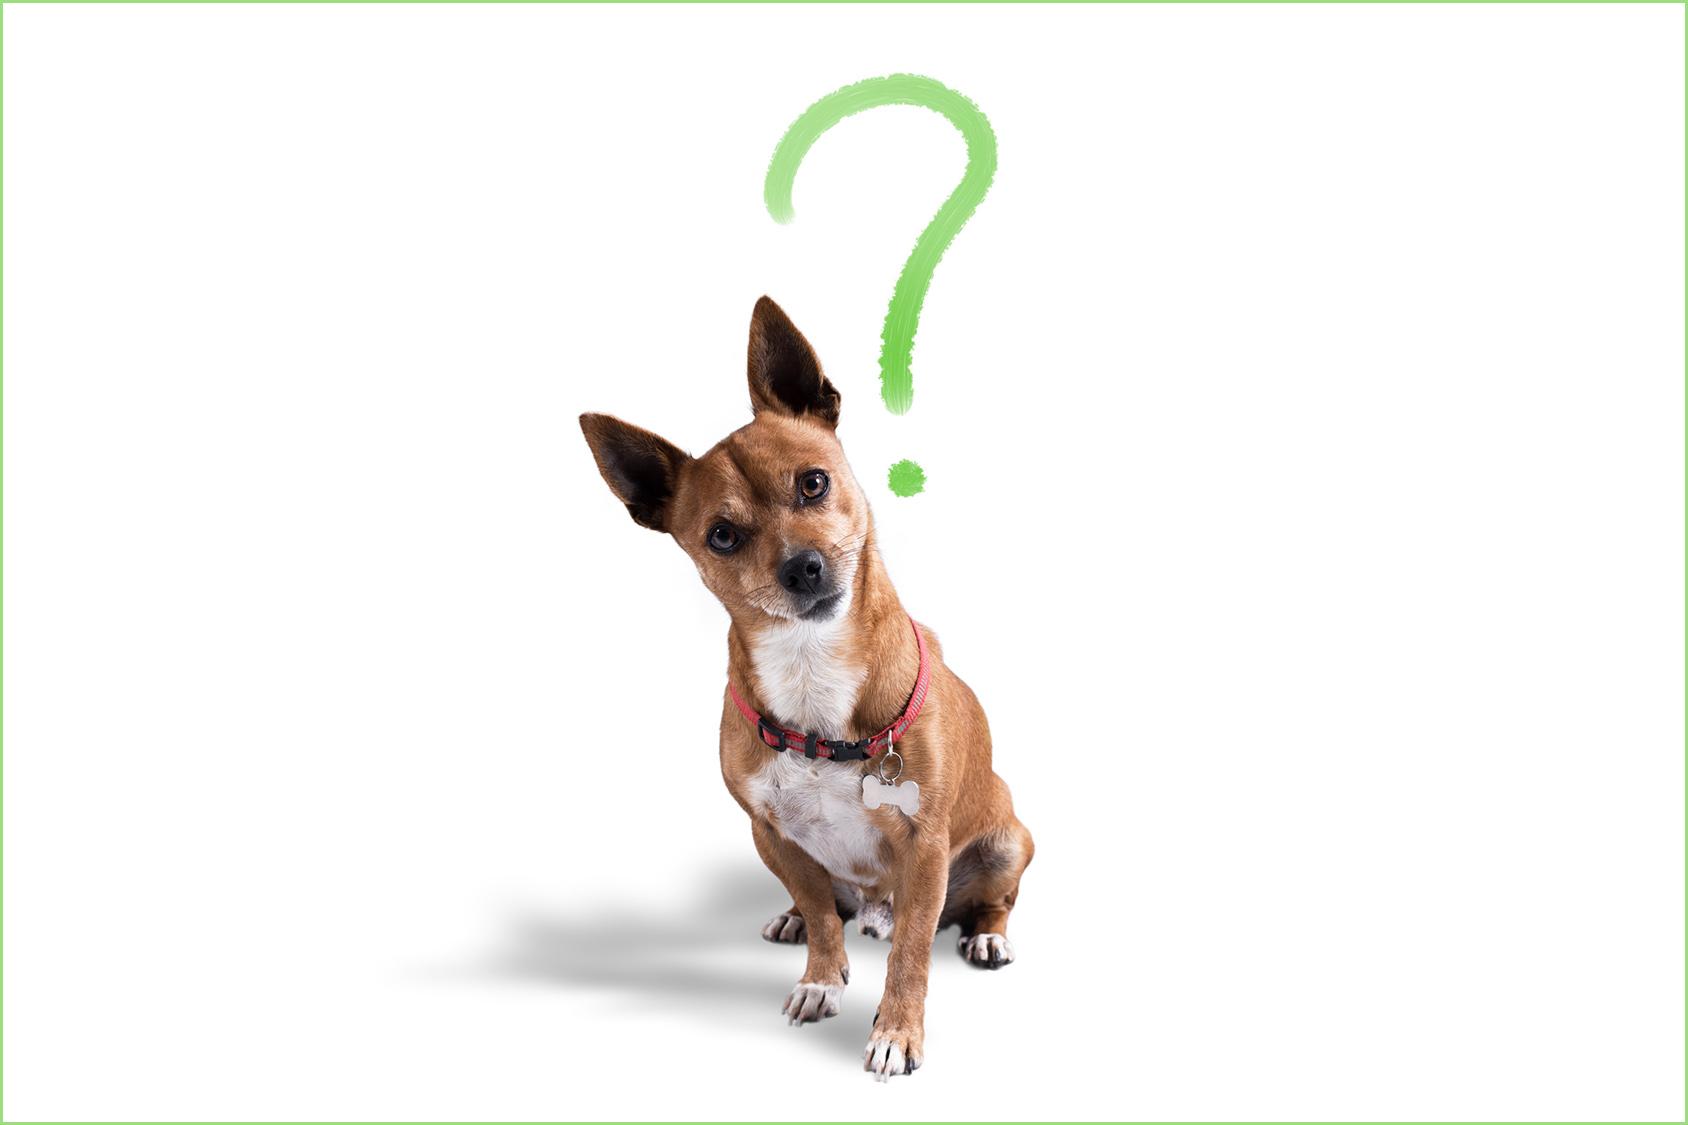 Blog cani: consigli per cani